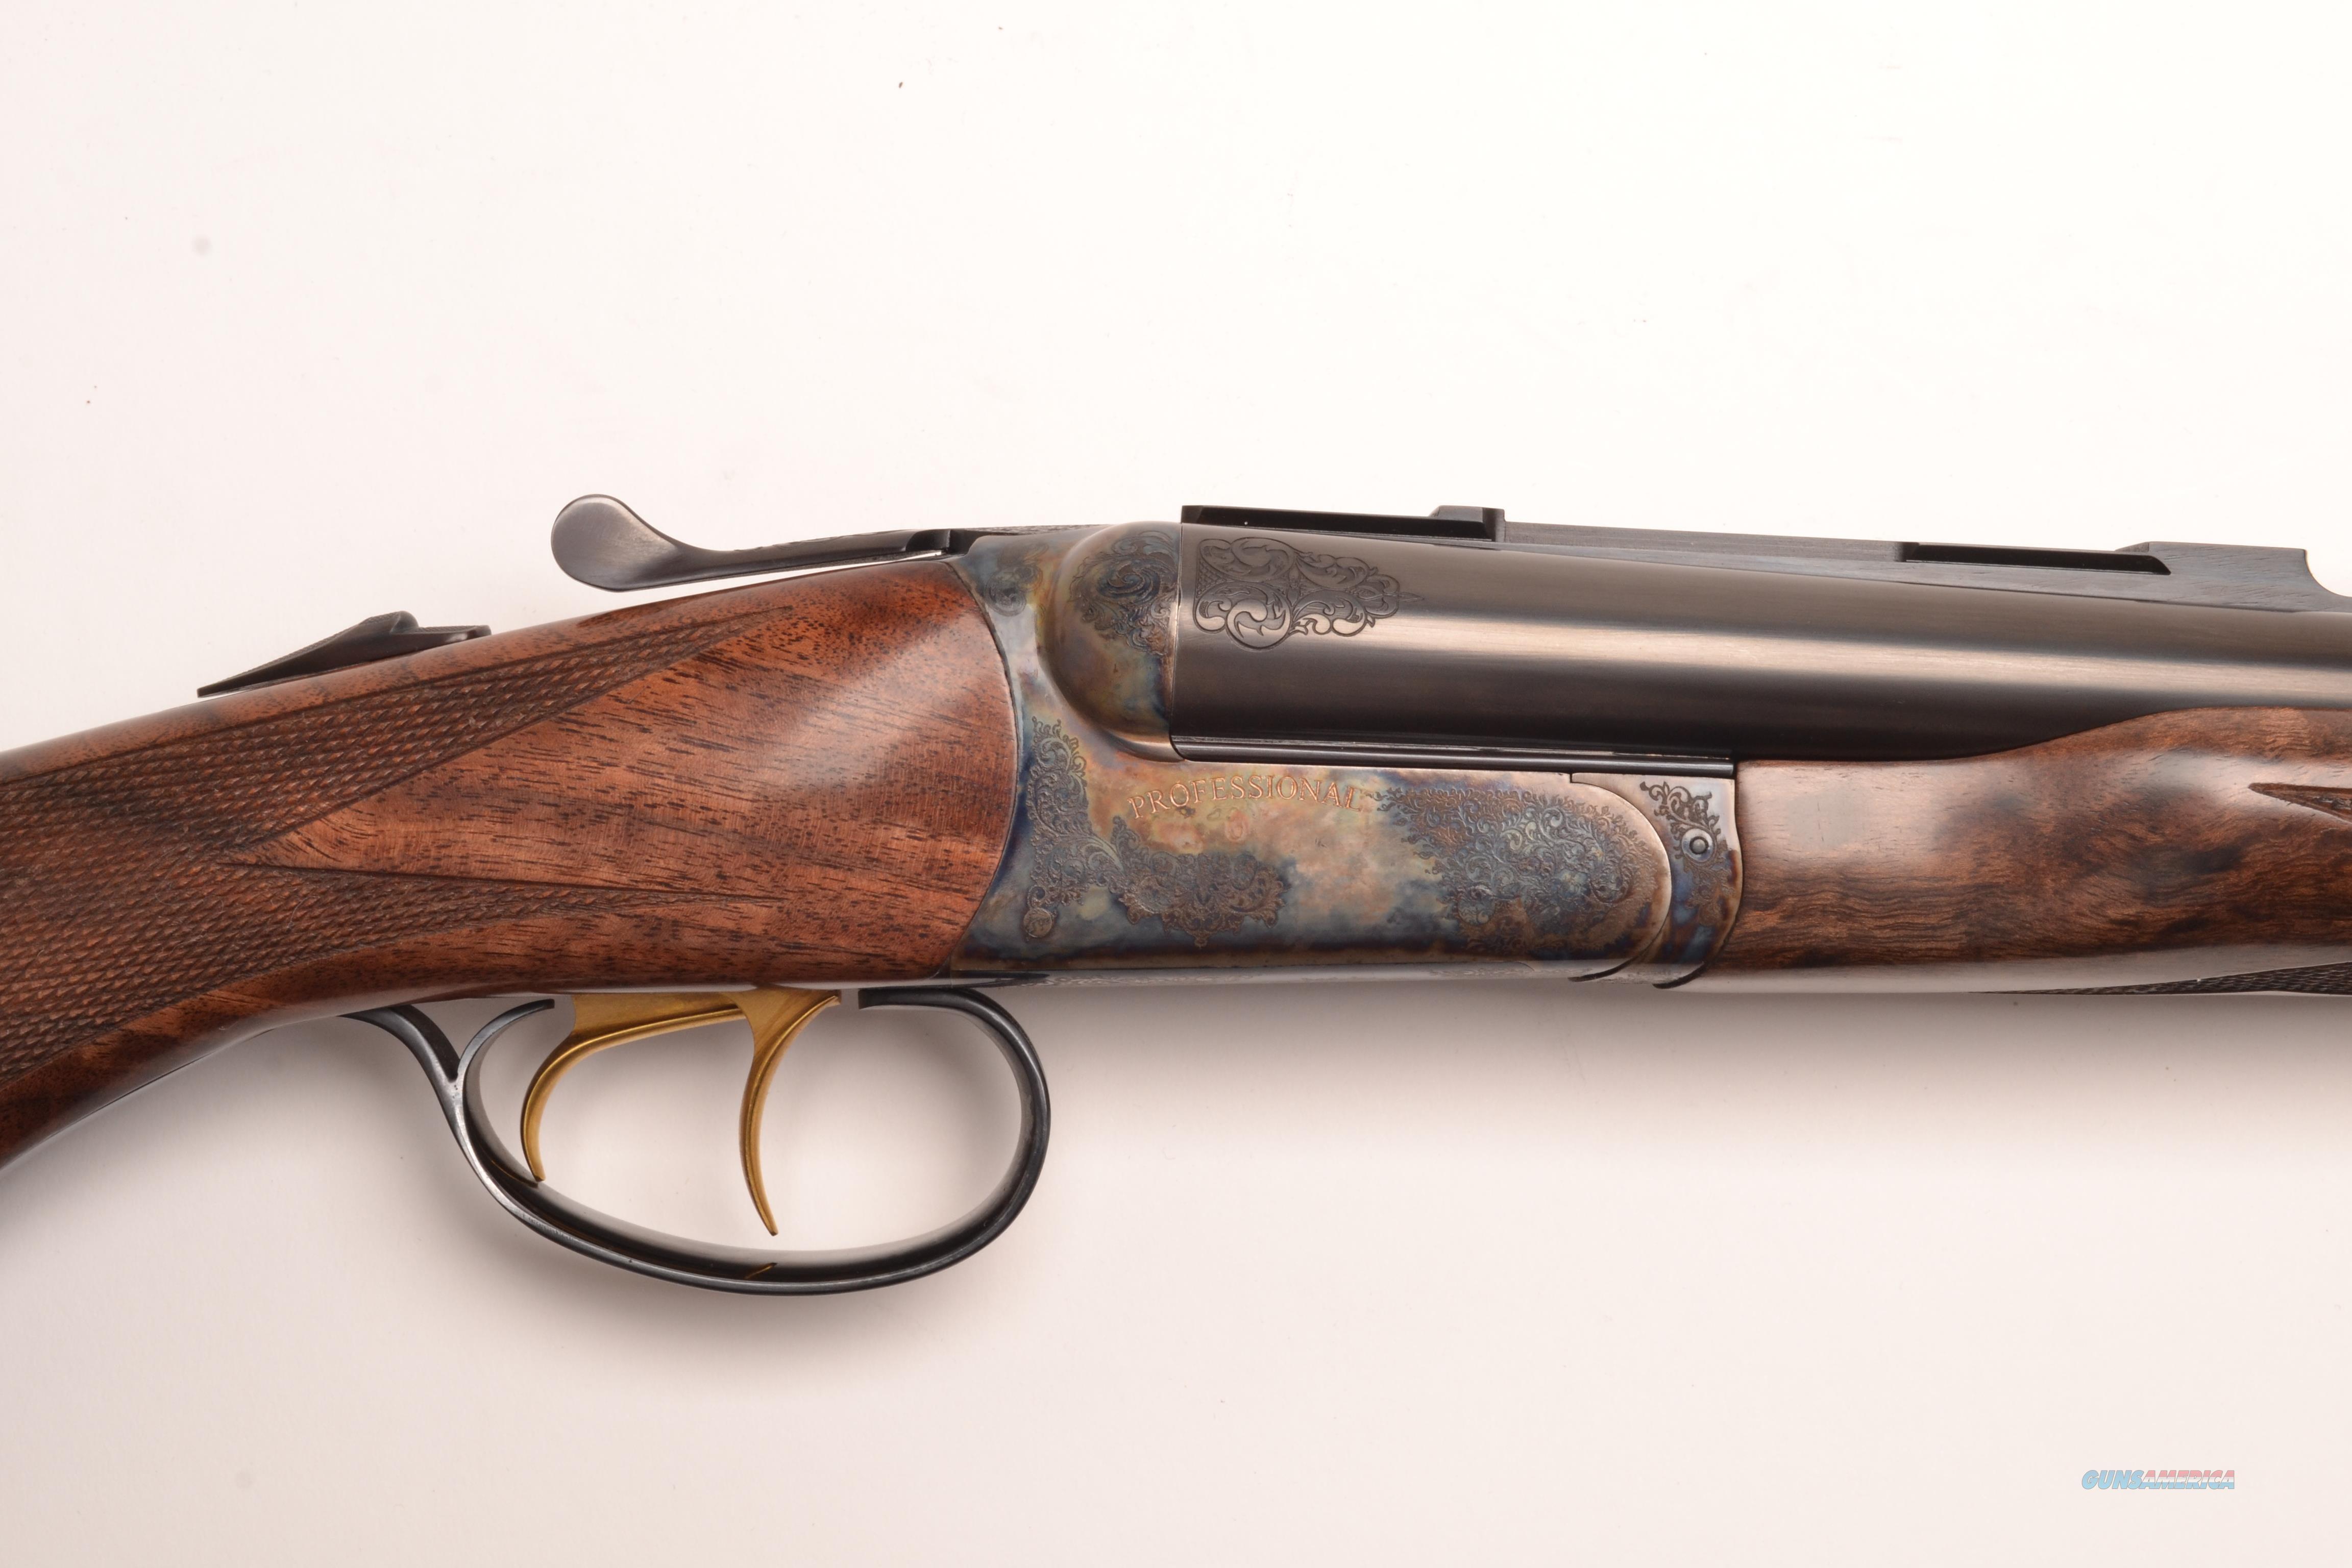 CSMC - RBL Professional, Sabot Slug Gun, 20ga.  Guns > Shotguns > Connecticut (Galazan) Shotguns